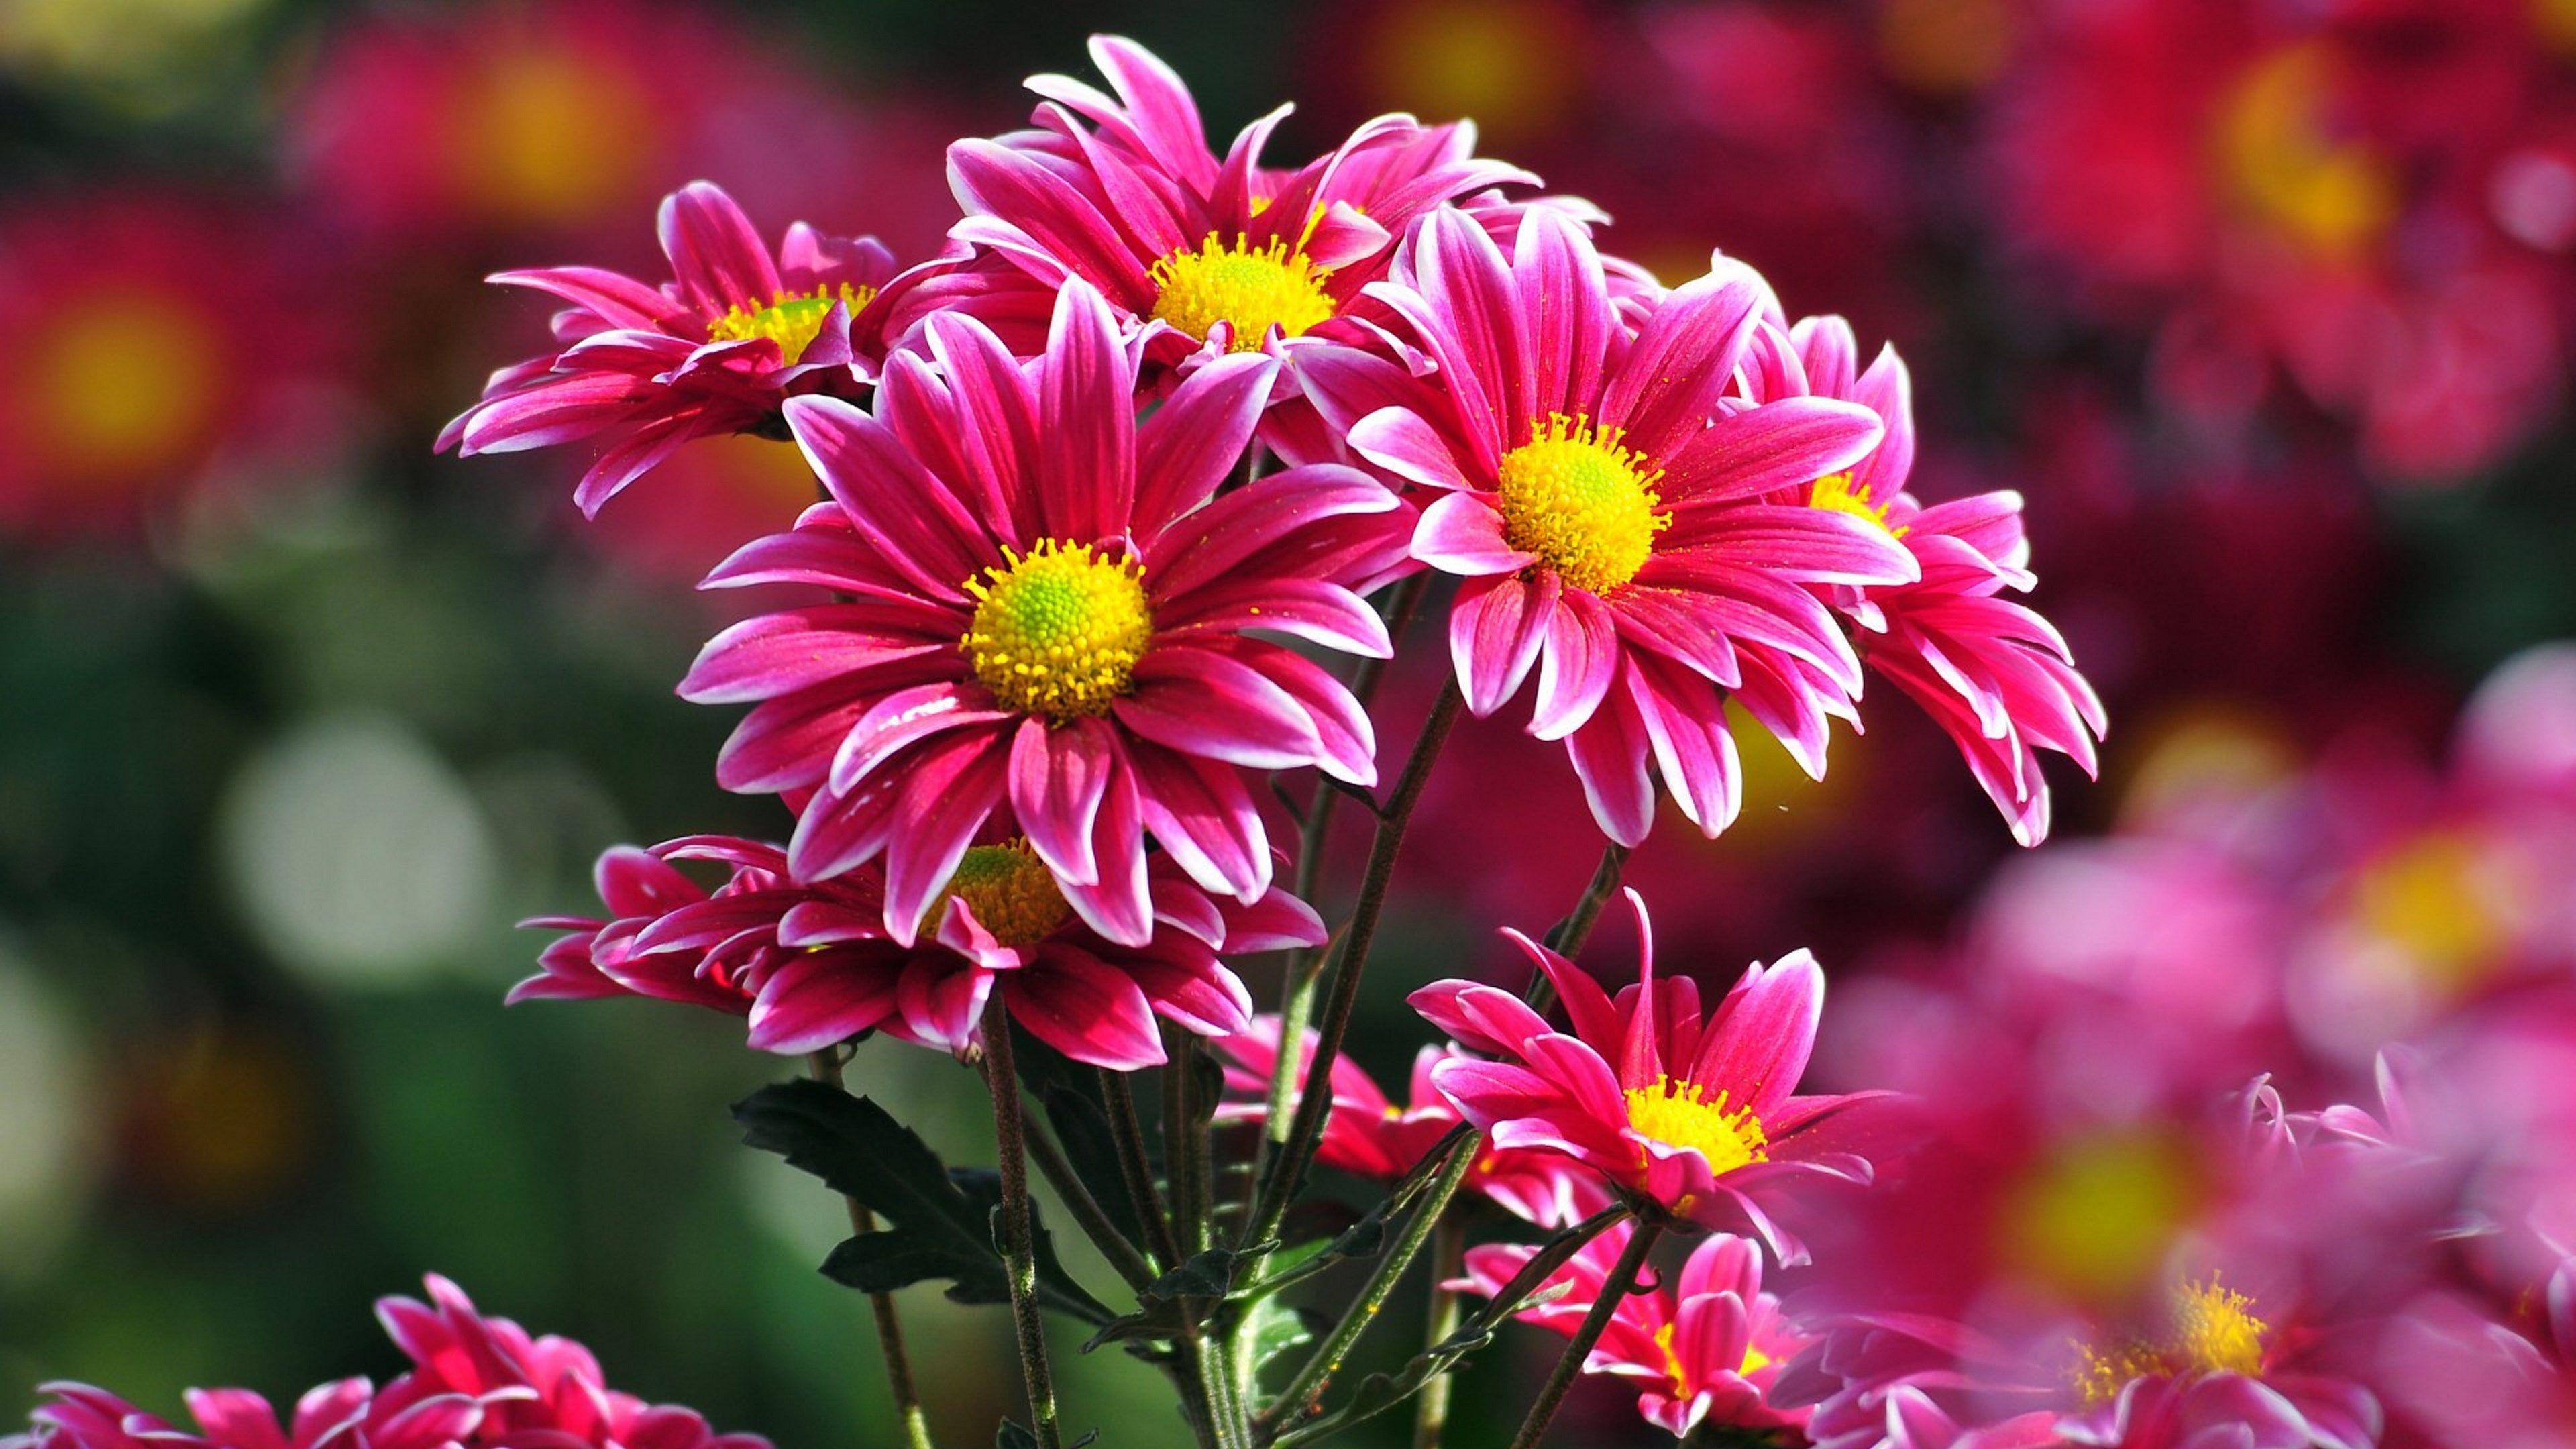 4k Pc Wallpaper Download 3840x2160 Beautiful Flowers Pictures Flower Pictures Flower Desktop Wallpaper